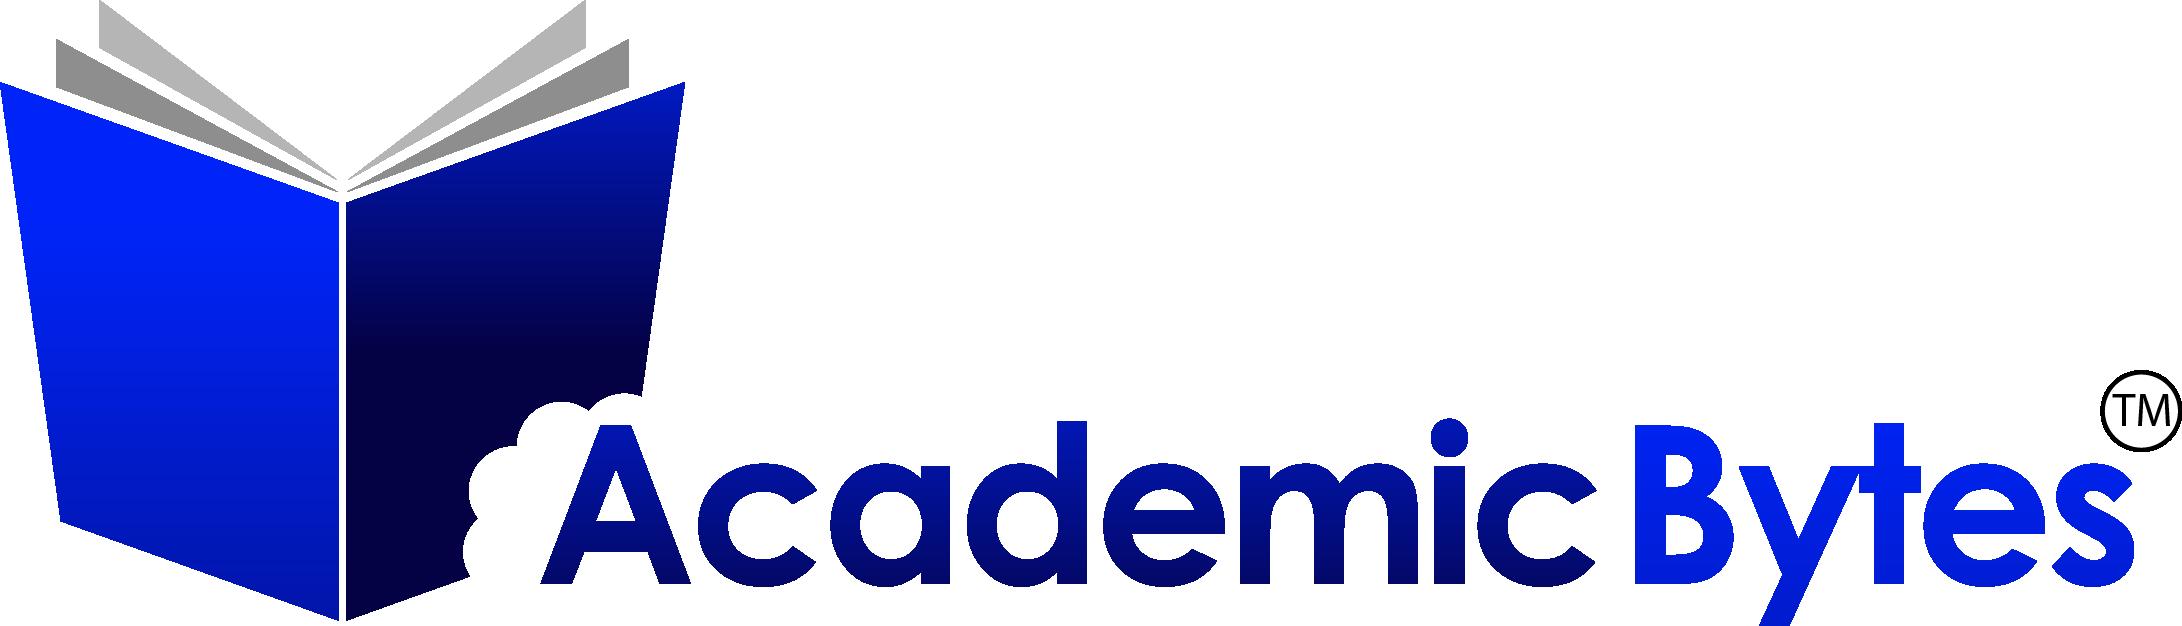 Academic Bytes